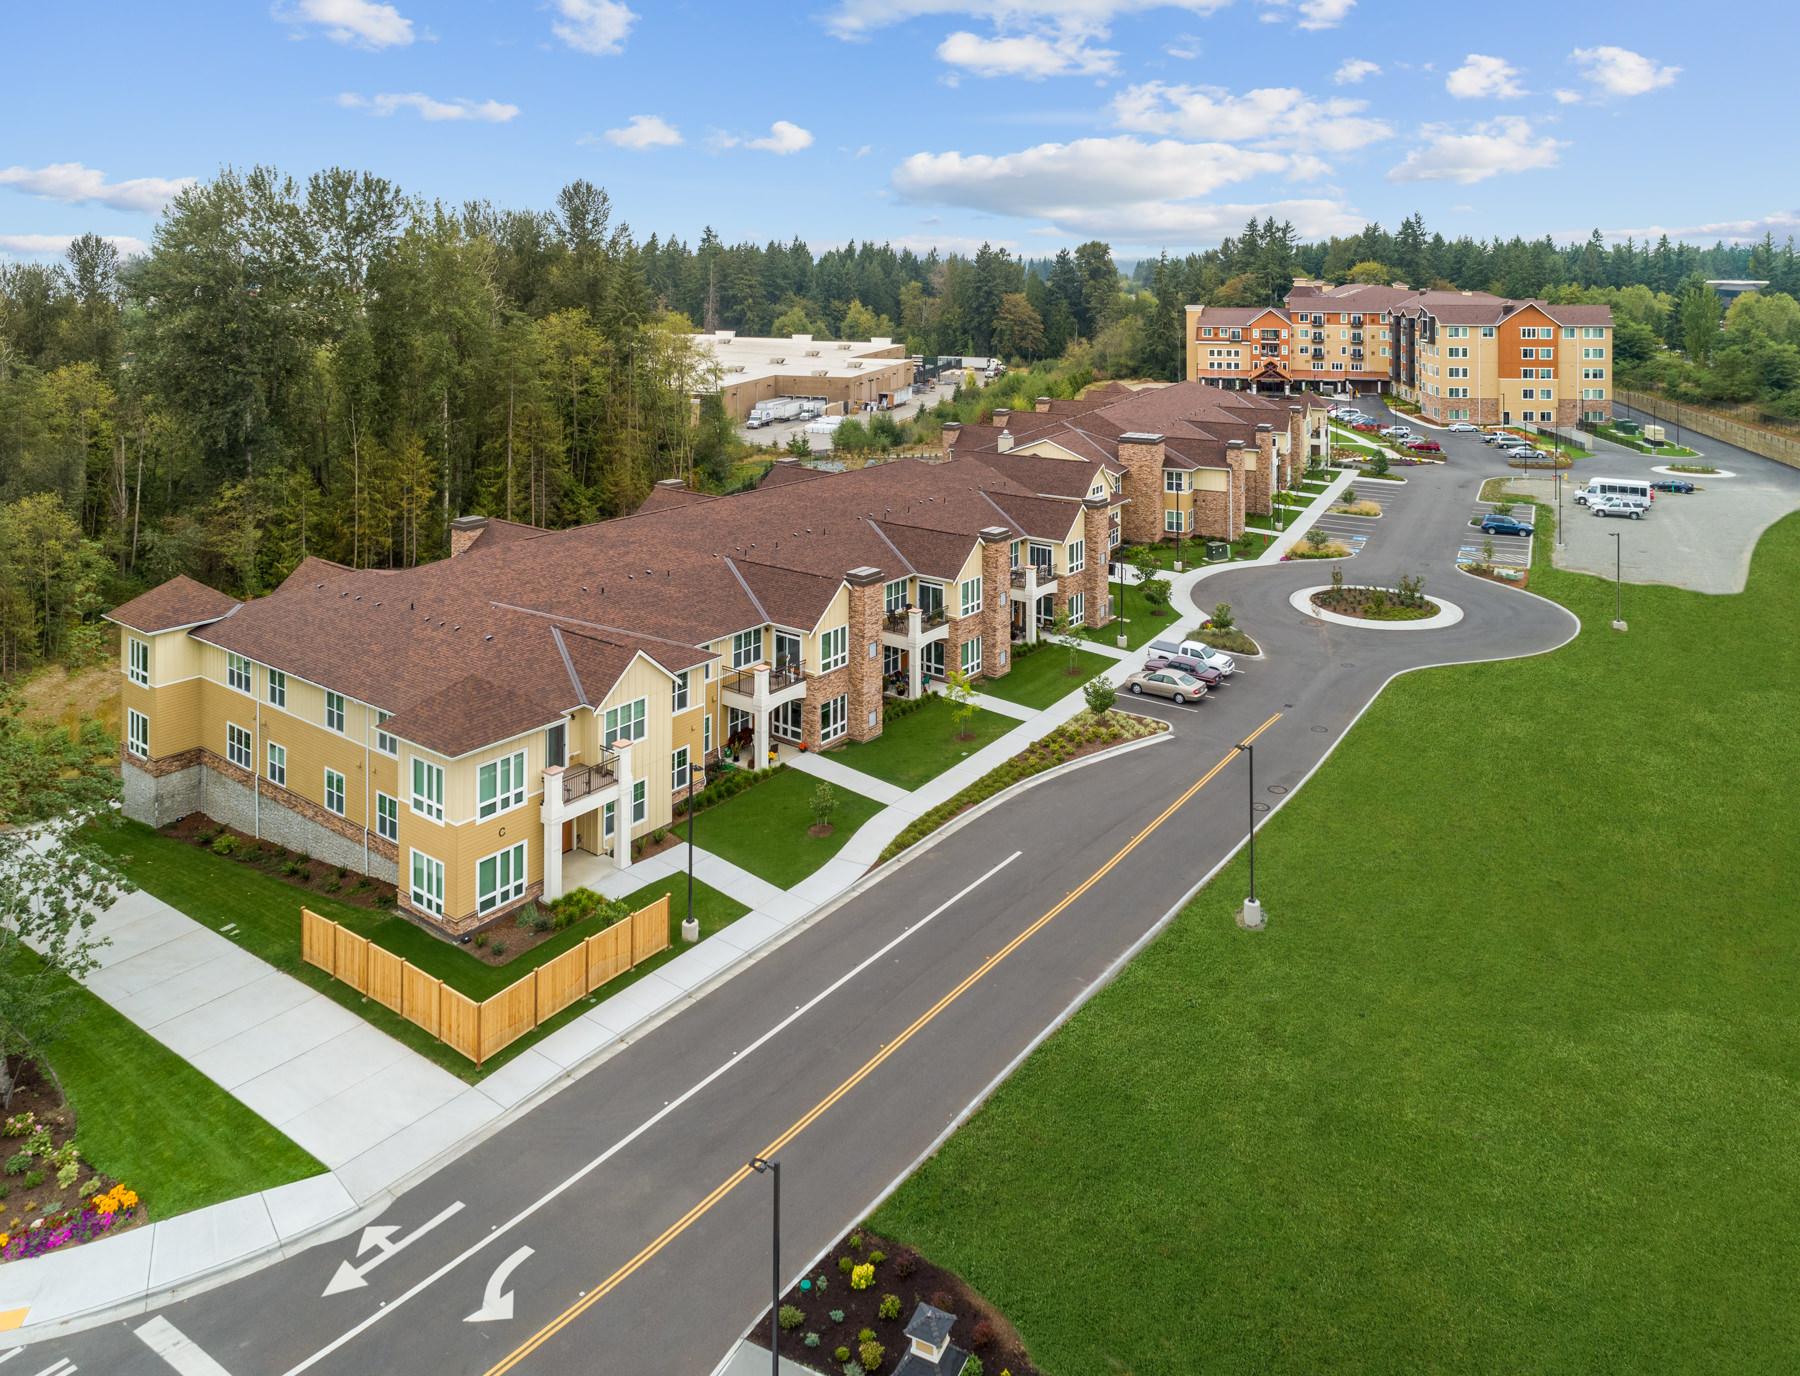 Construction drone photography in Olympia Washington